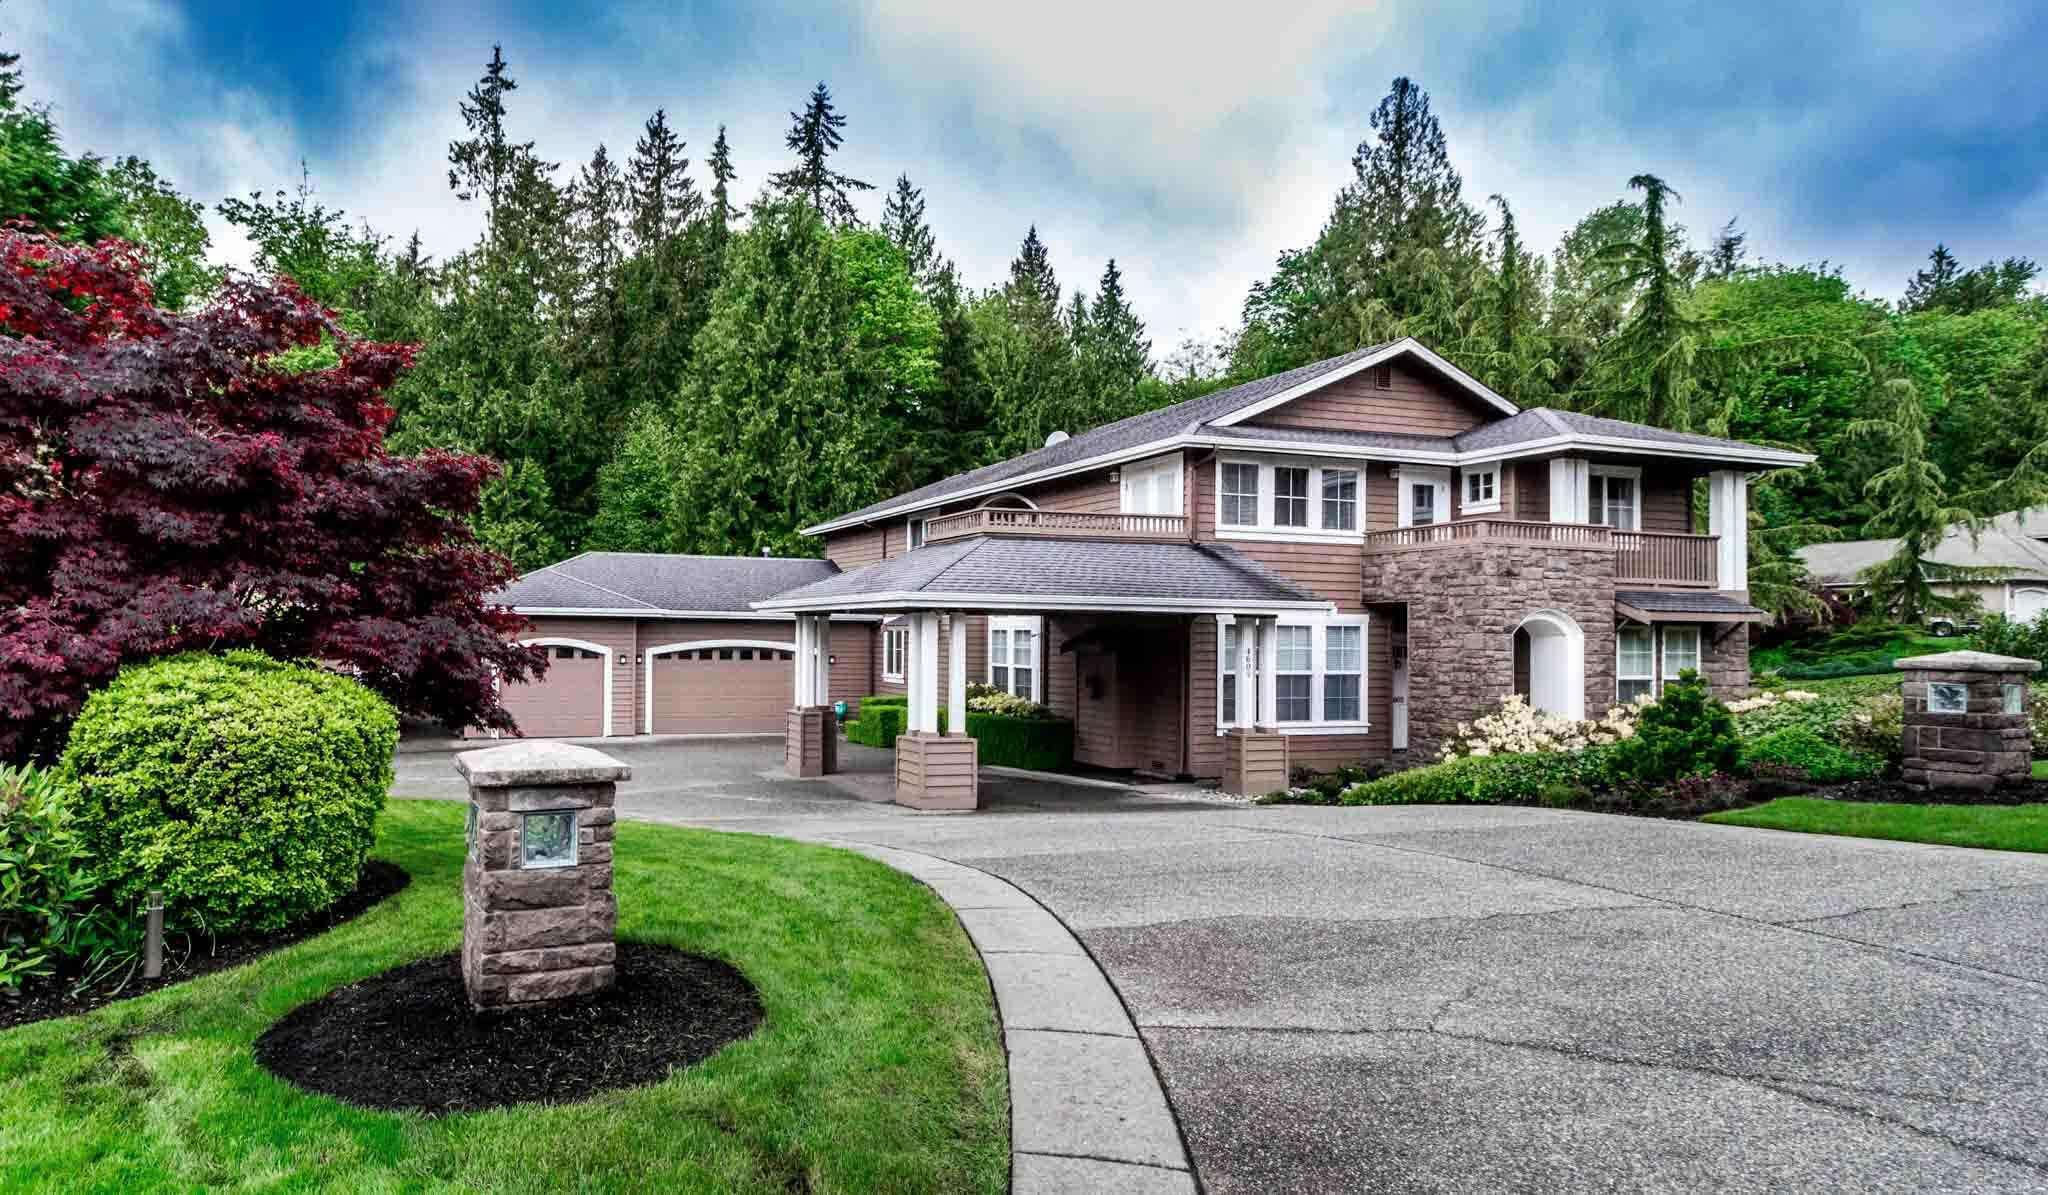 Single Family for Sale at 4602 113th Ave SE Snohomish, Washington 98290 United States